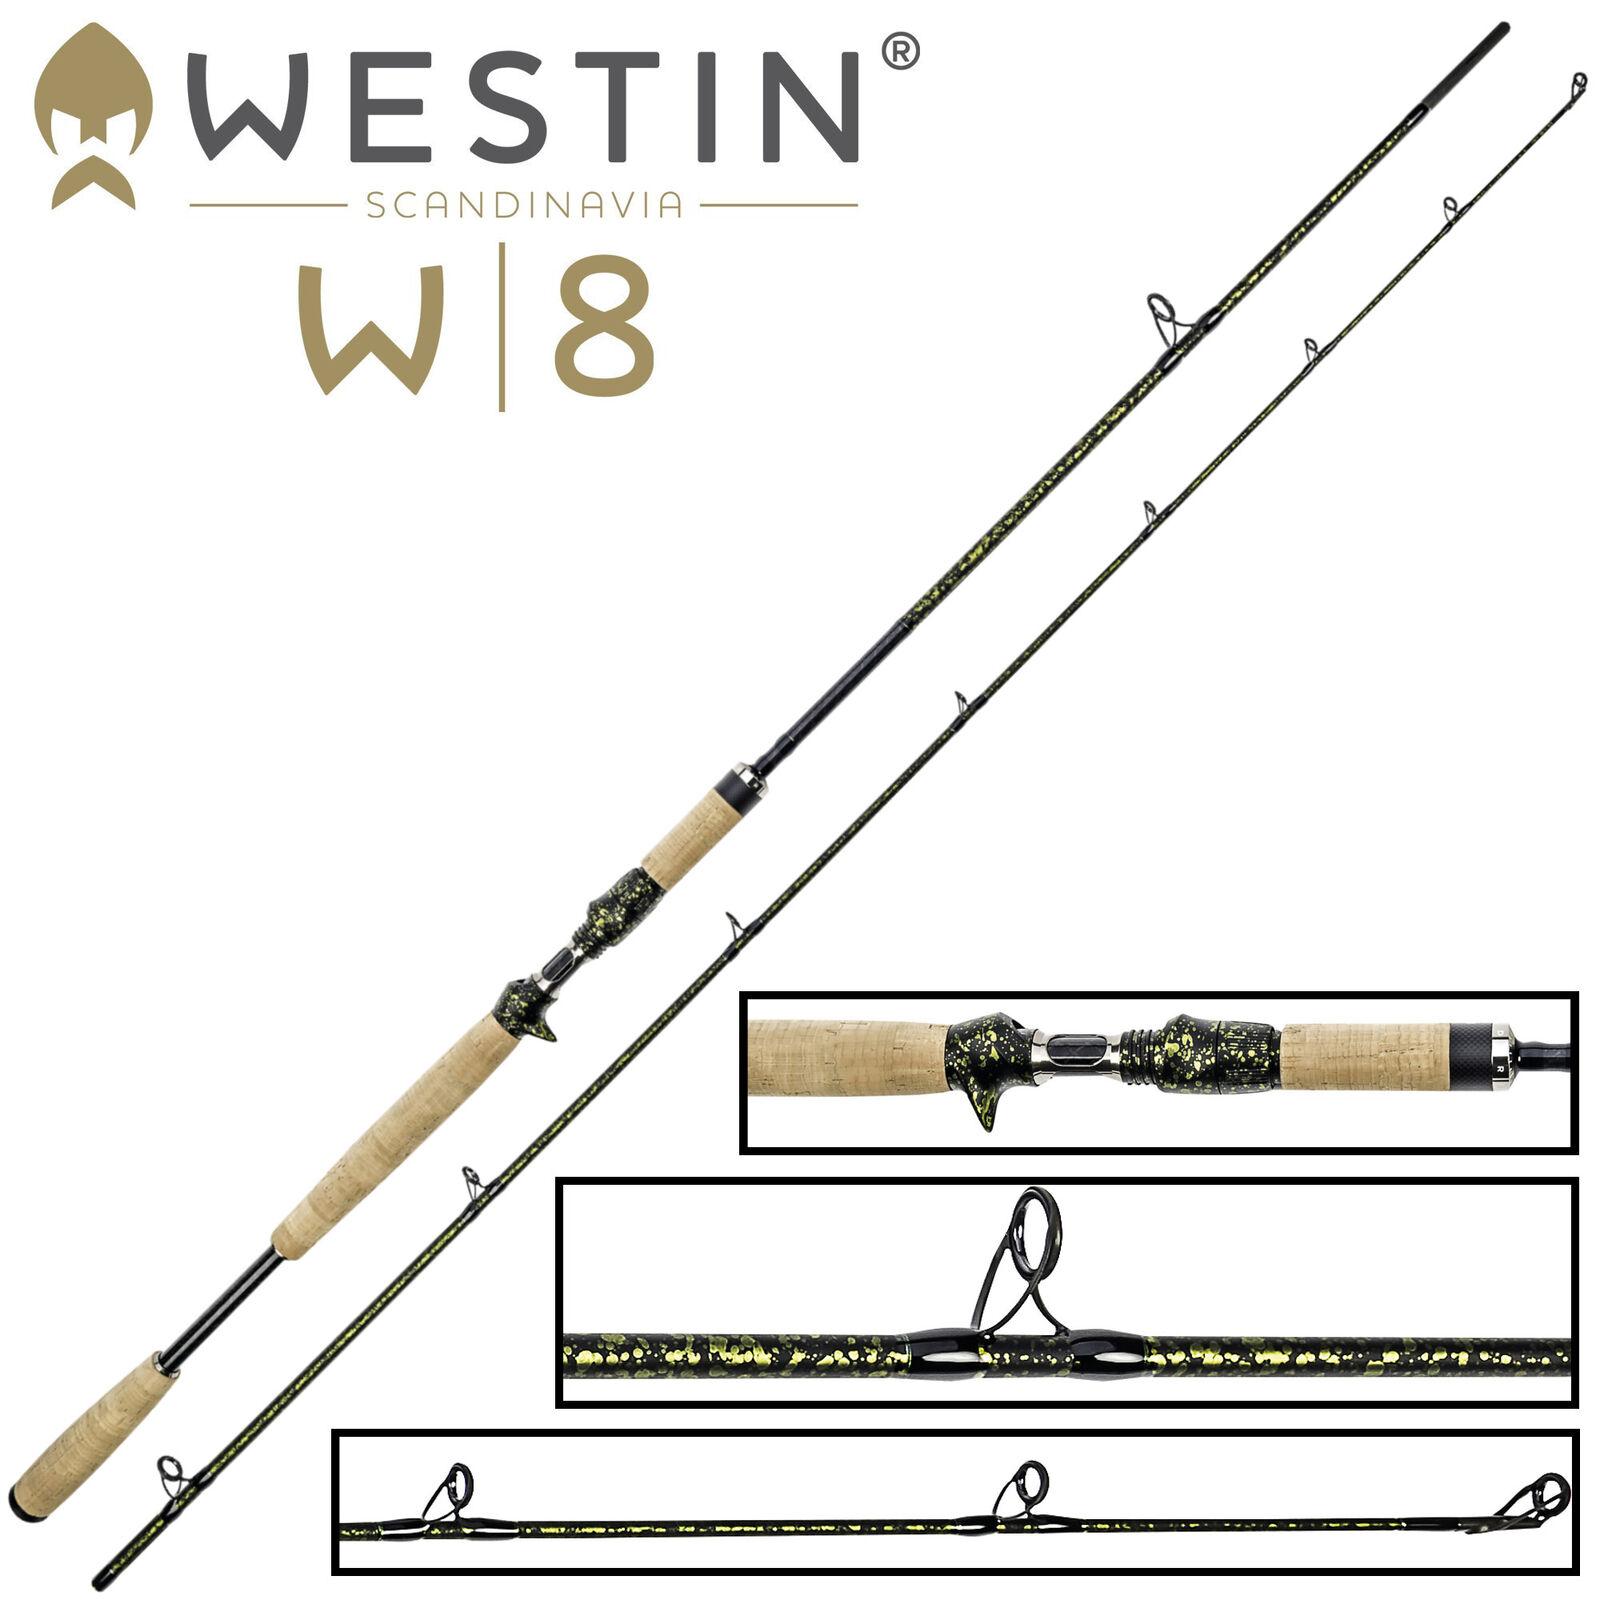 Westin W8 Powercast-T PF Edition 2,33m 60-180g - Hechtrute zum Spinnfischen